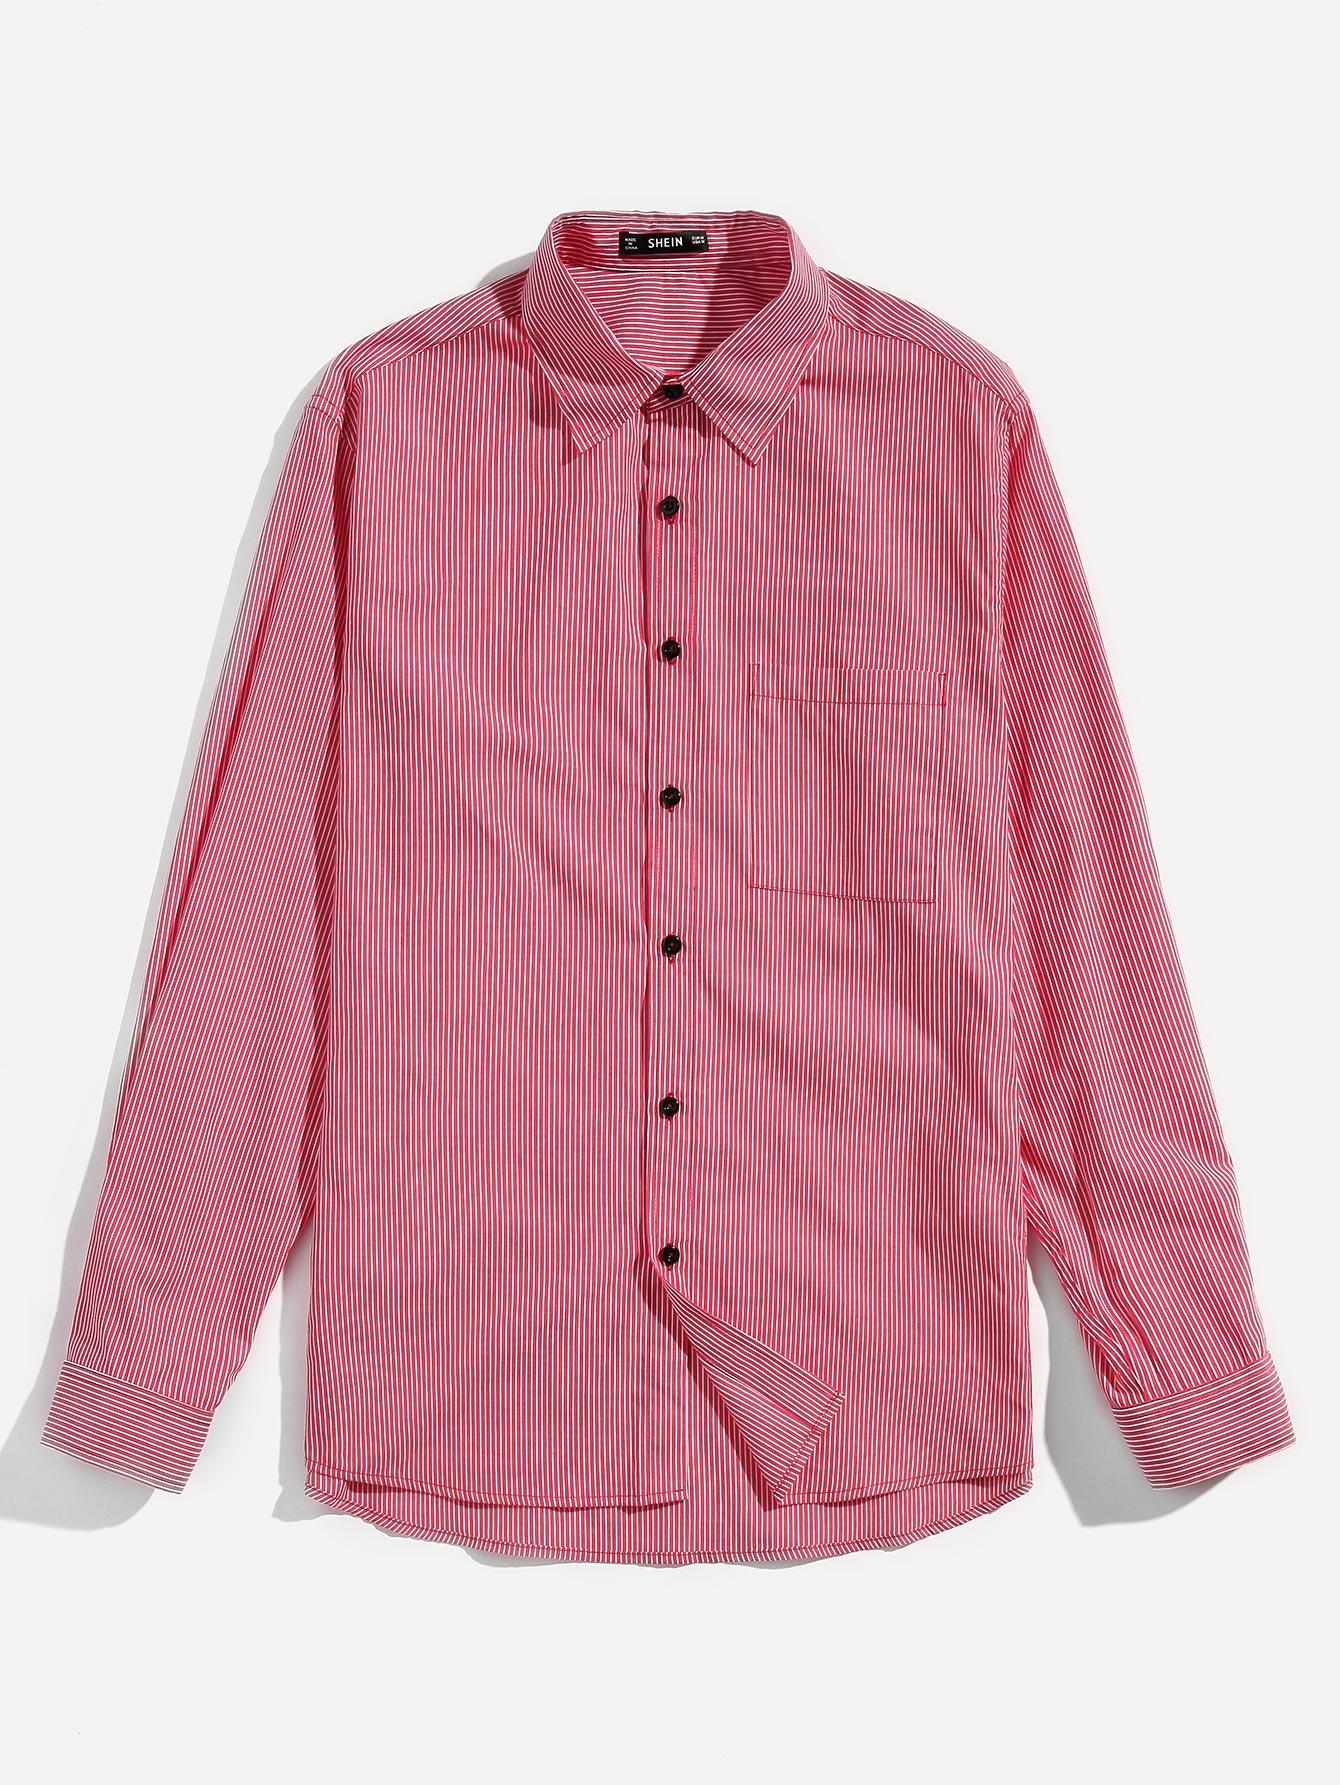 Купить Мужская футболка с манжетами, null, SheIn